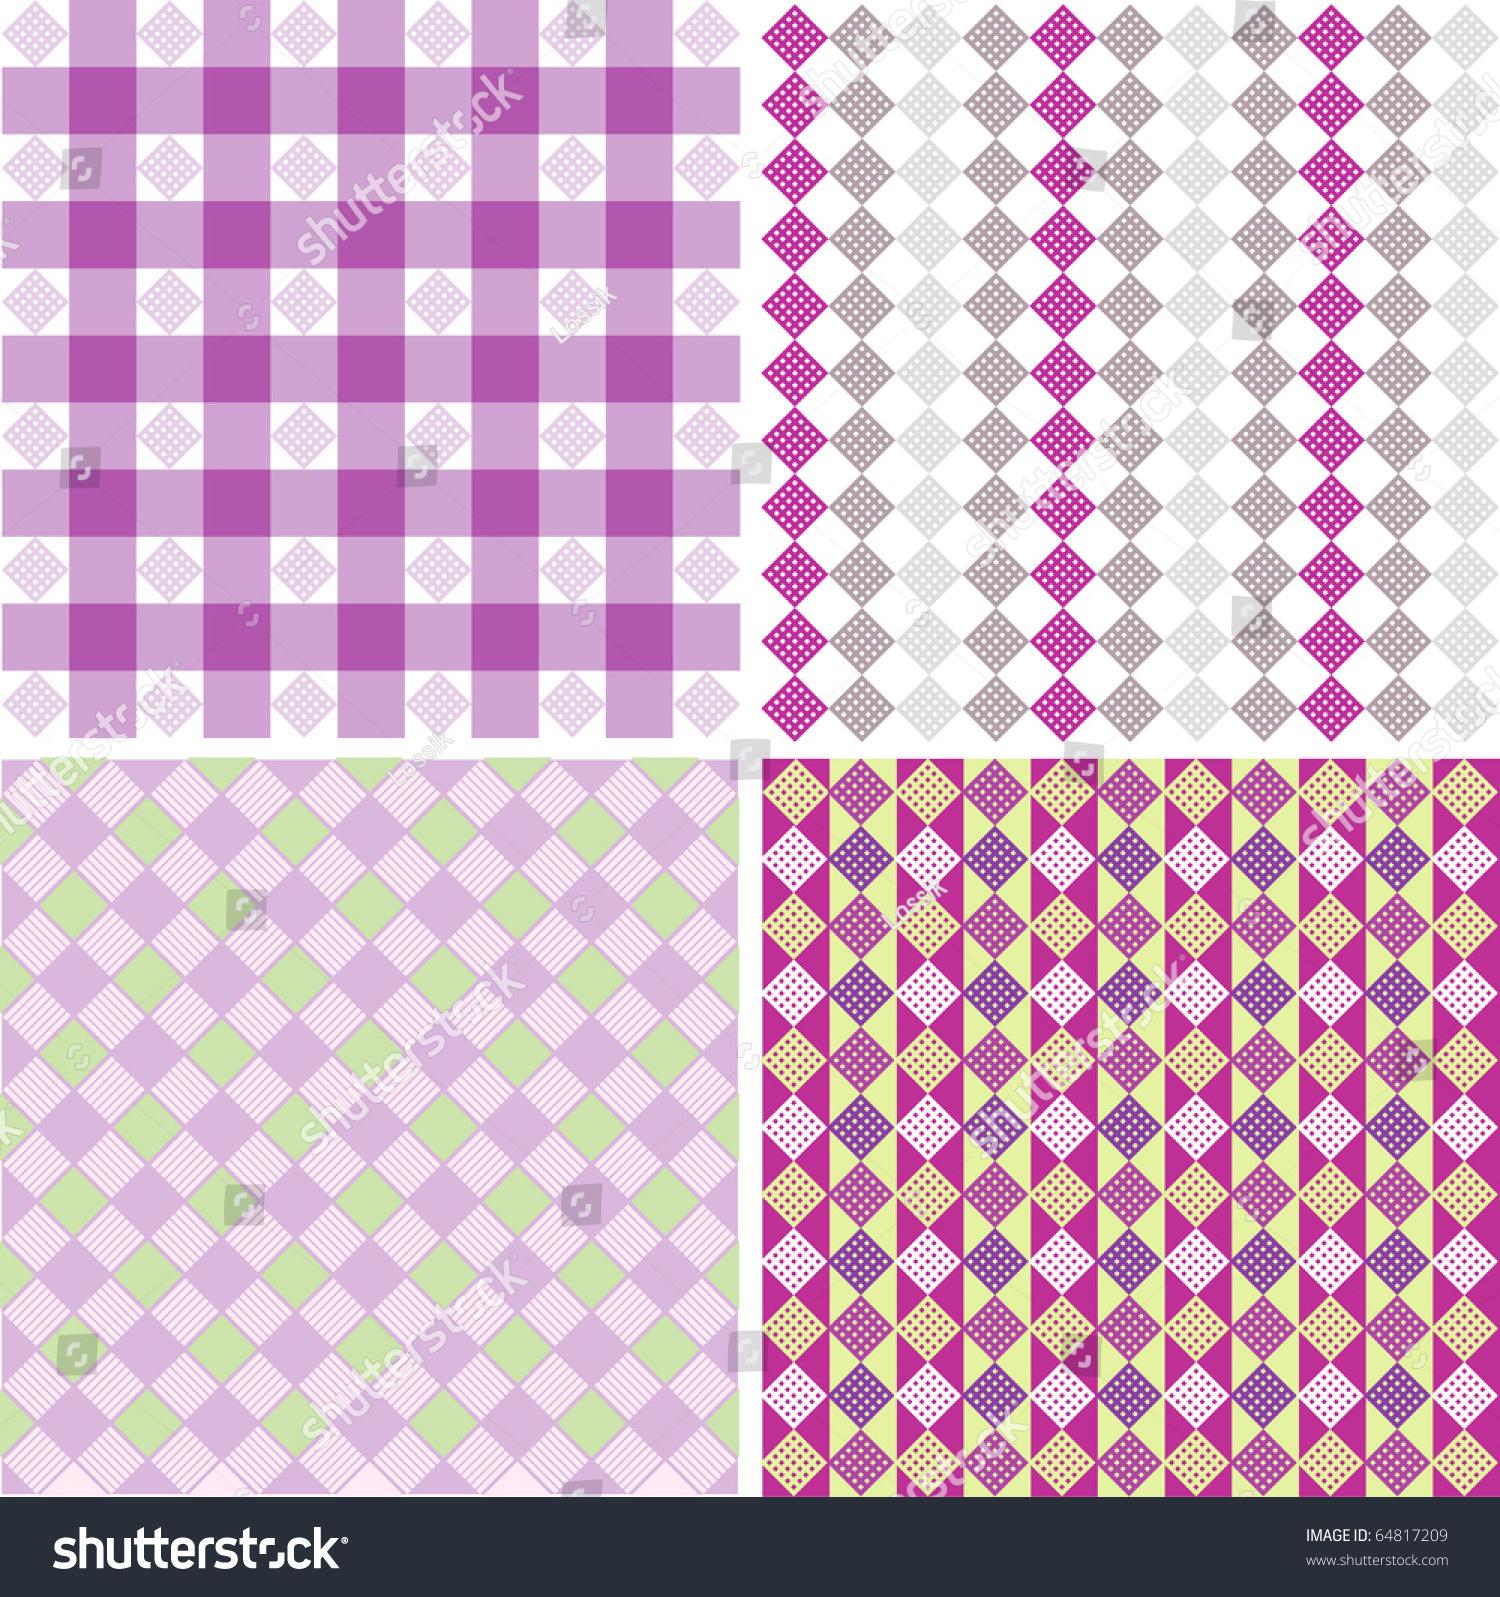 Vector Element Of Geometric Shapes Diamond Square Line